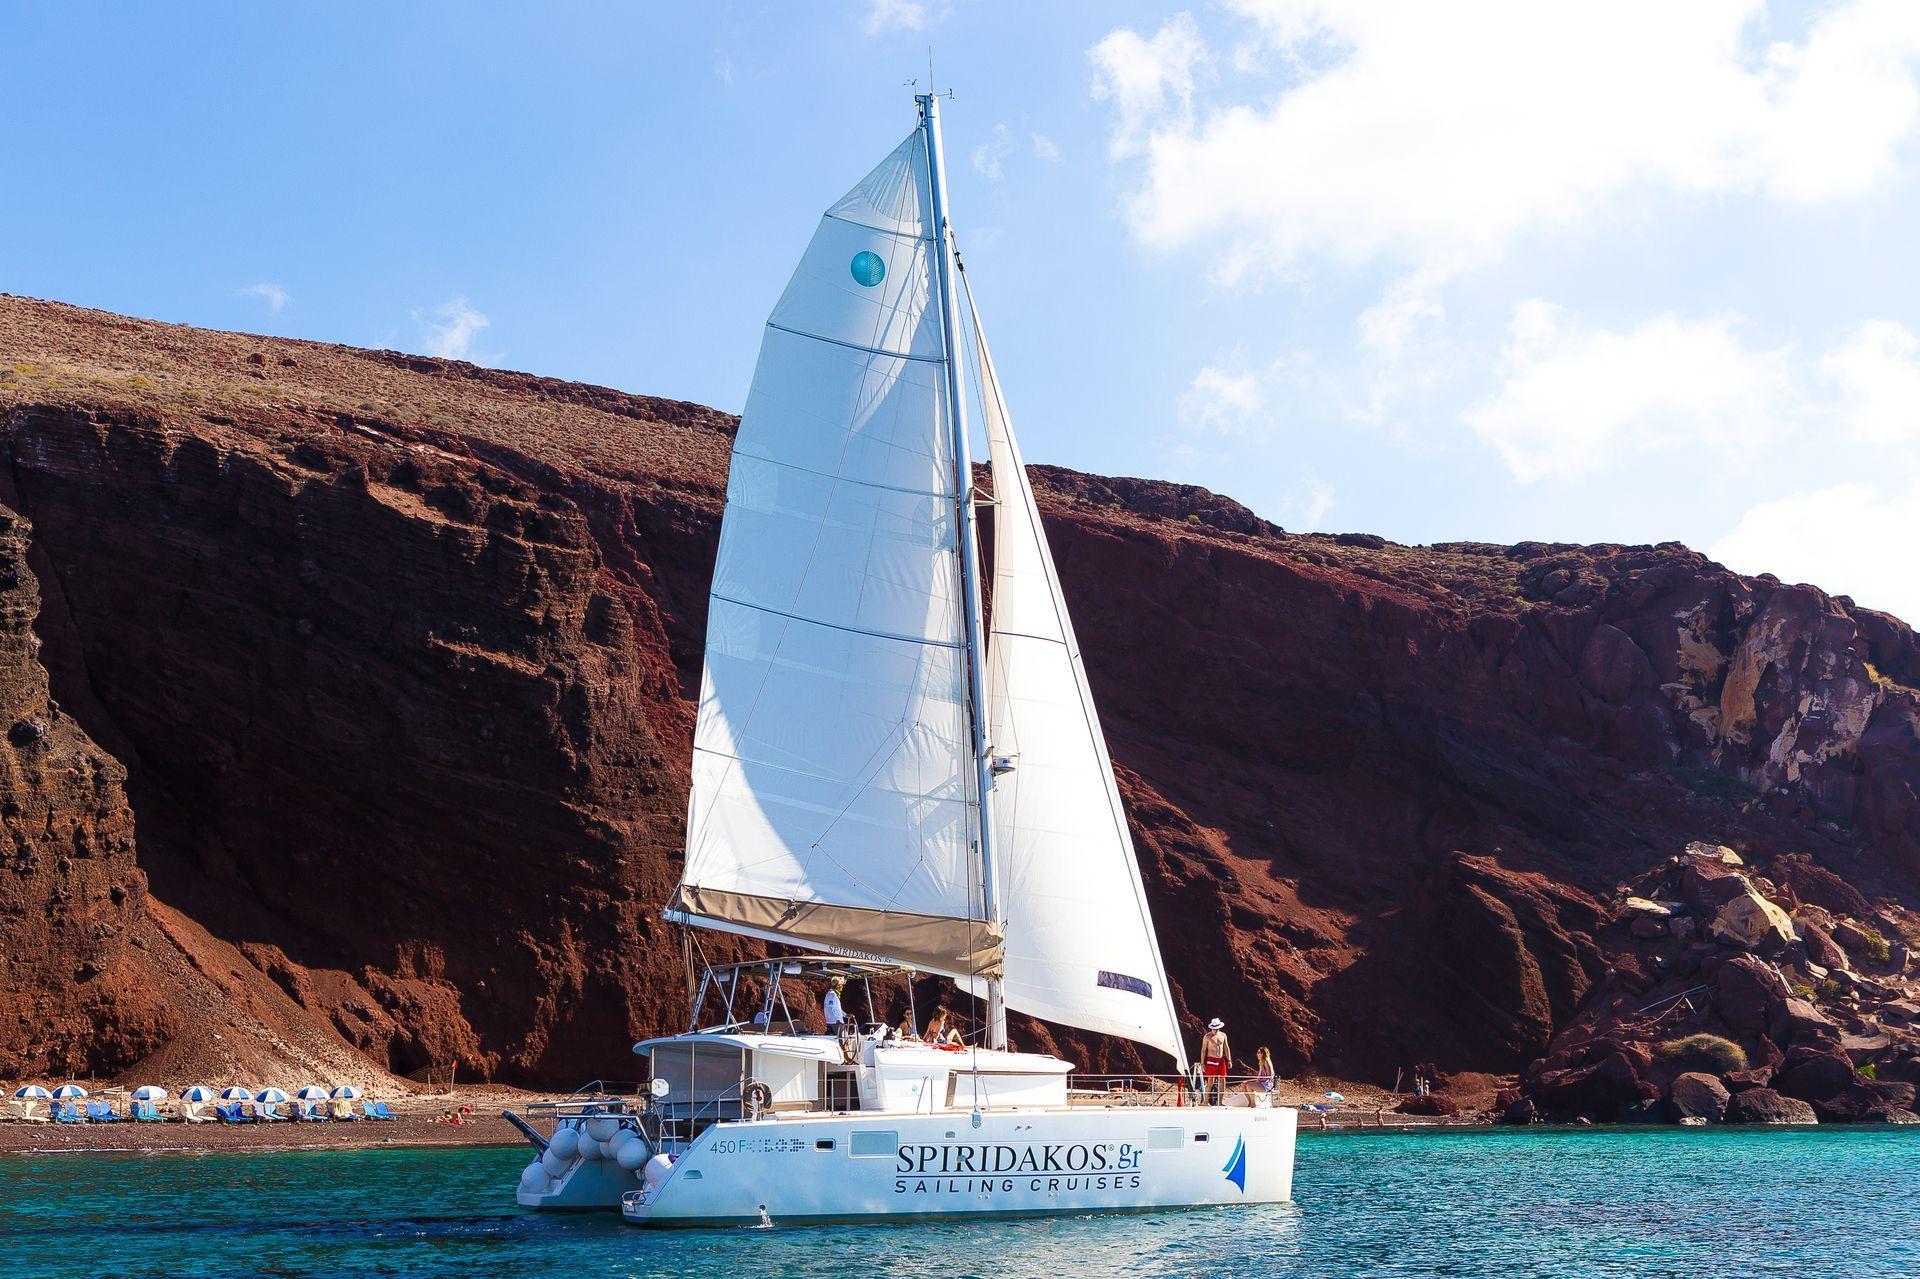 Santorini day trips to other islands with Spiridakos Sailing